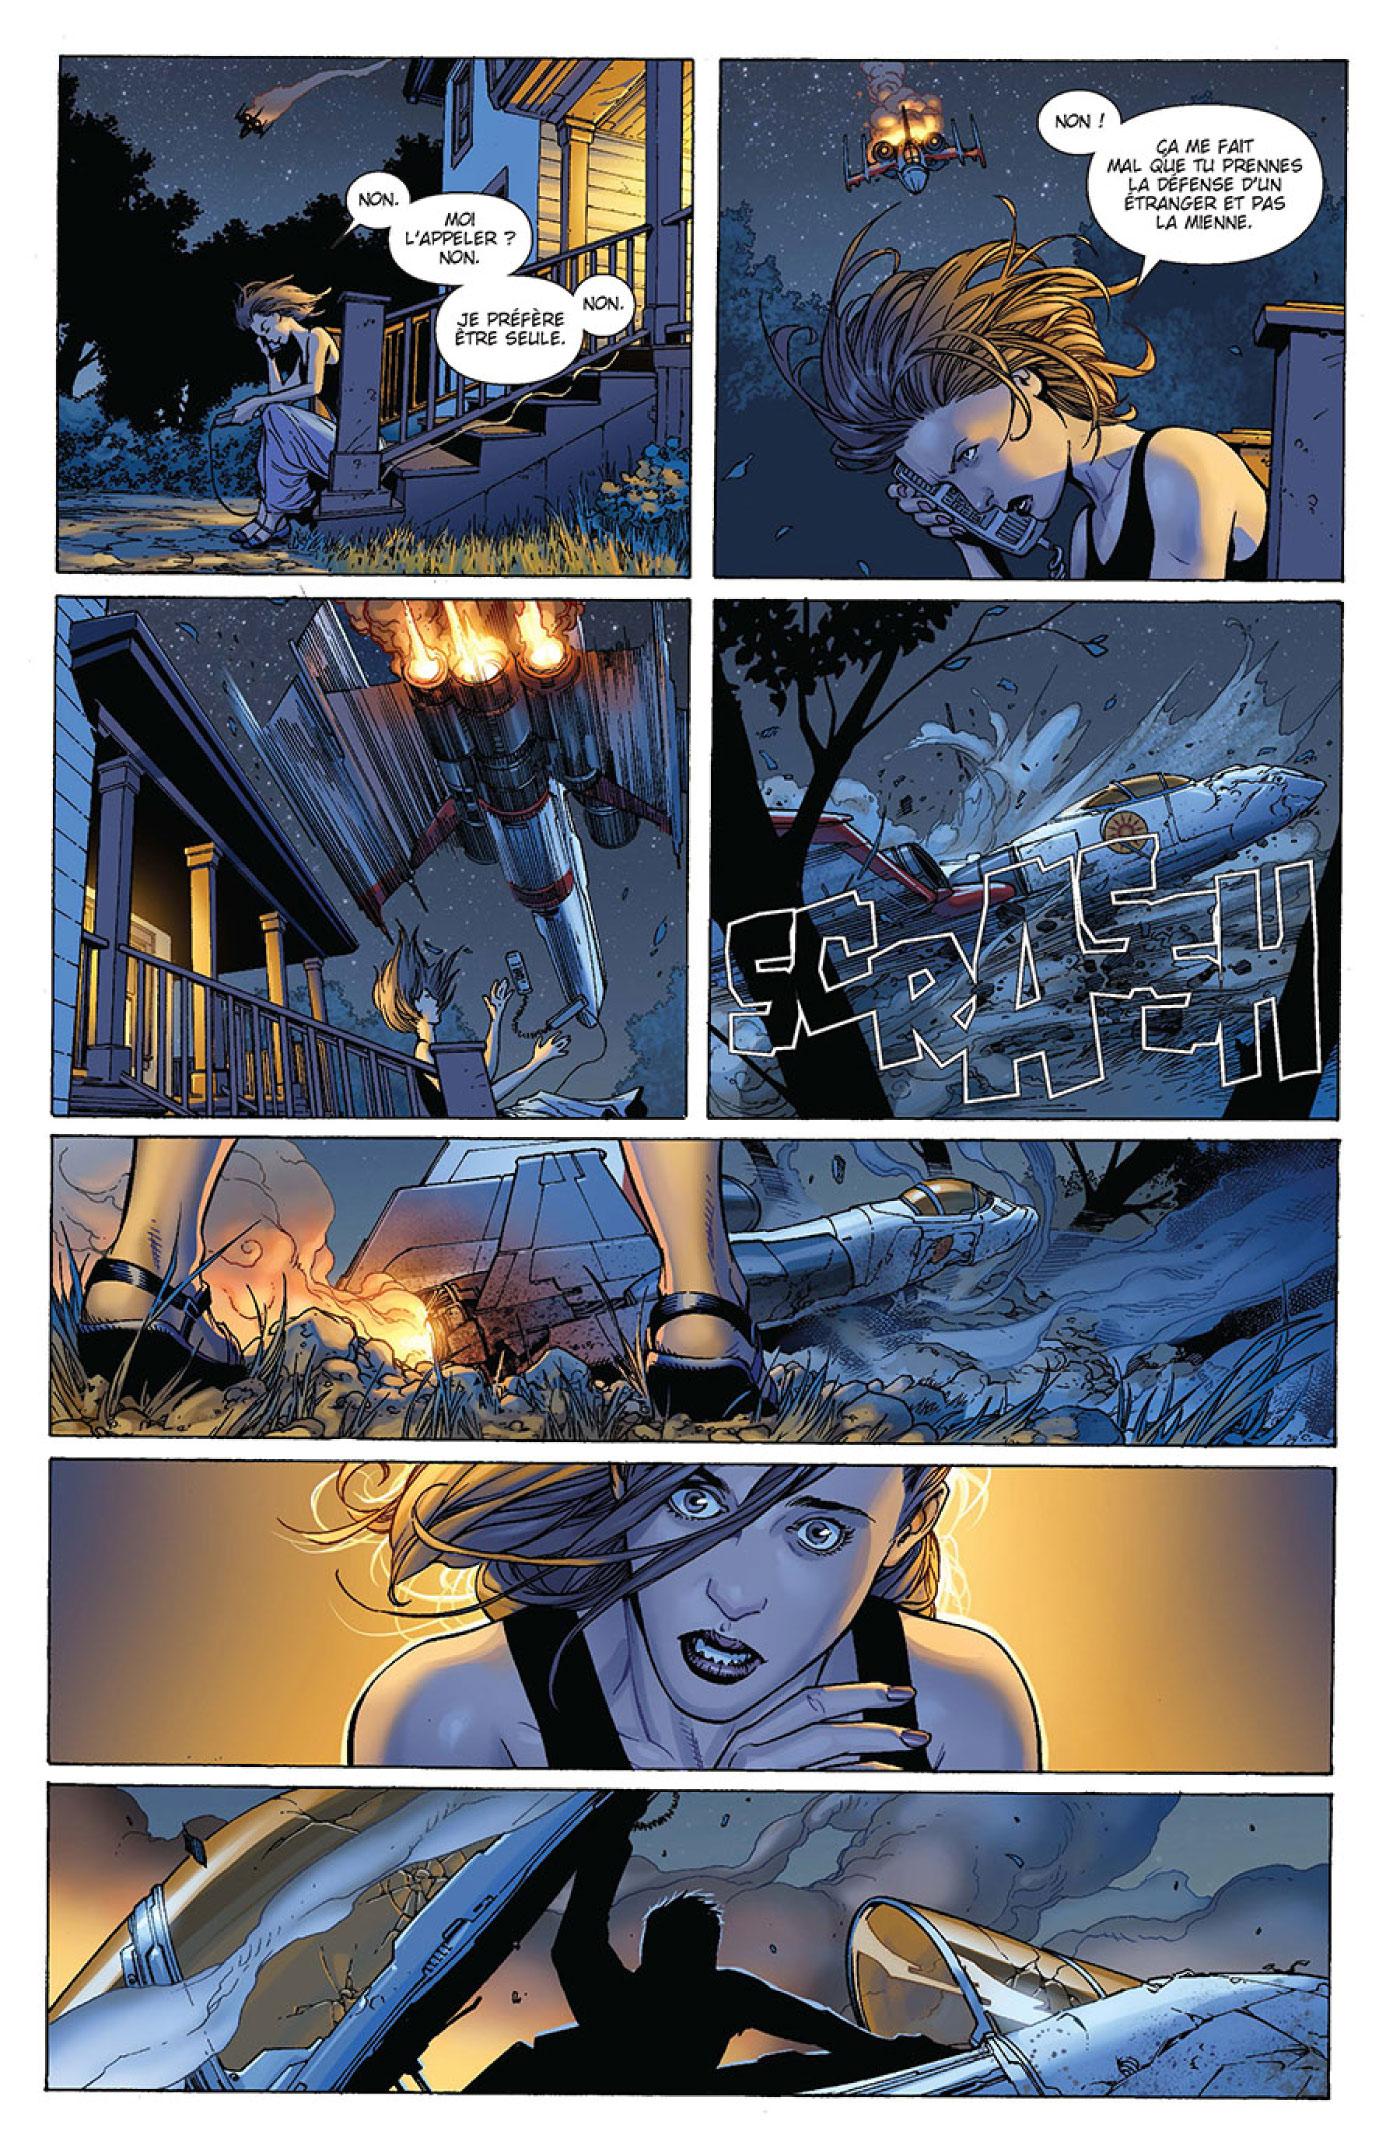 preview de Les Gardiens de la Galaxie (vol.3) T1